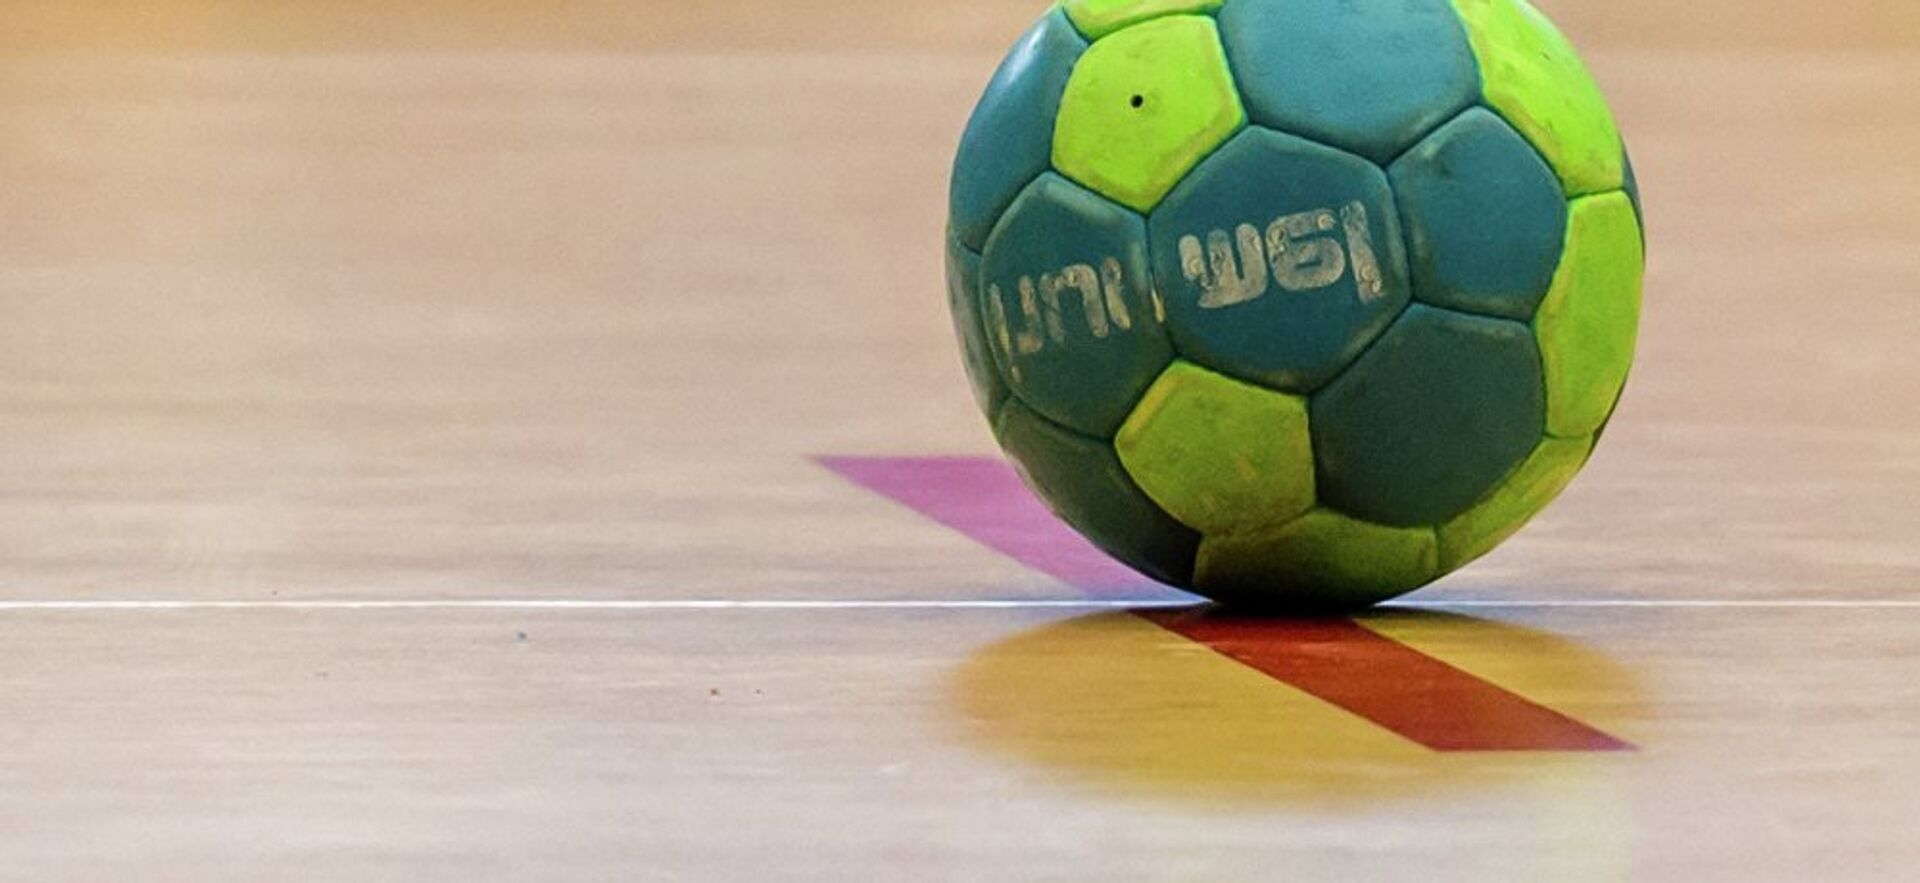 Handball - Sputnik France, 1920, 05.08.2021